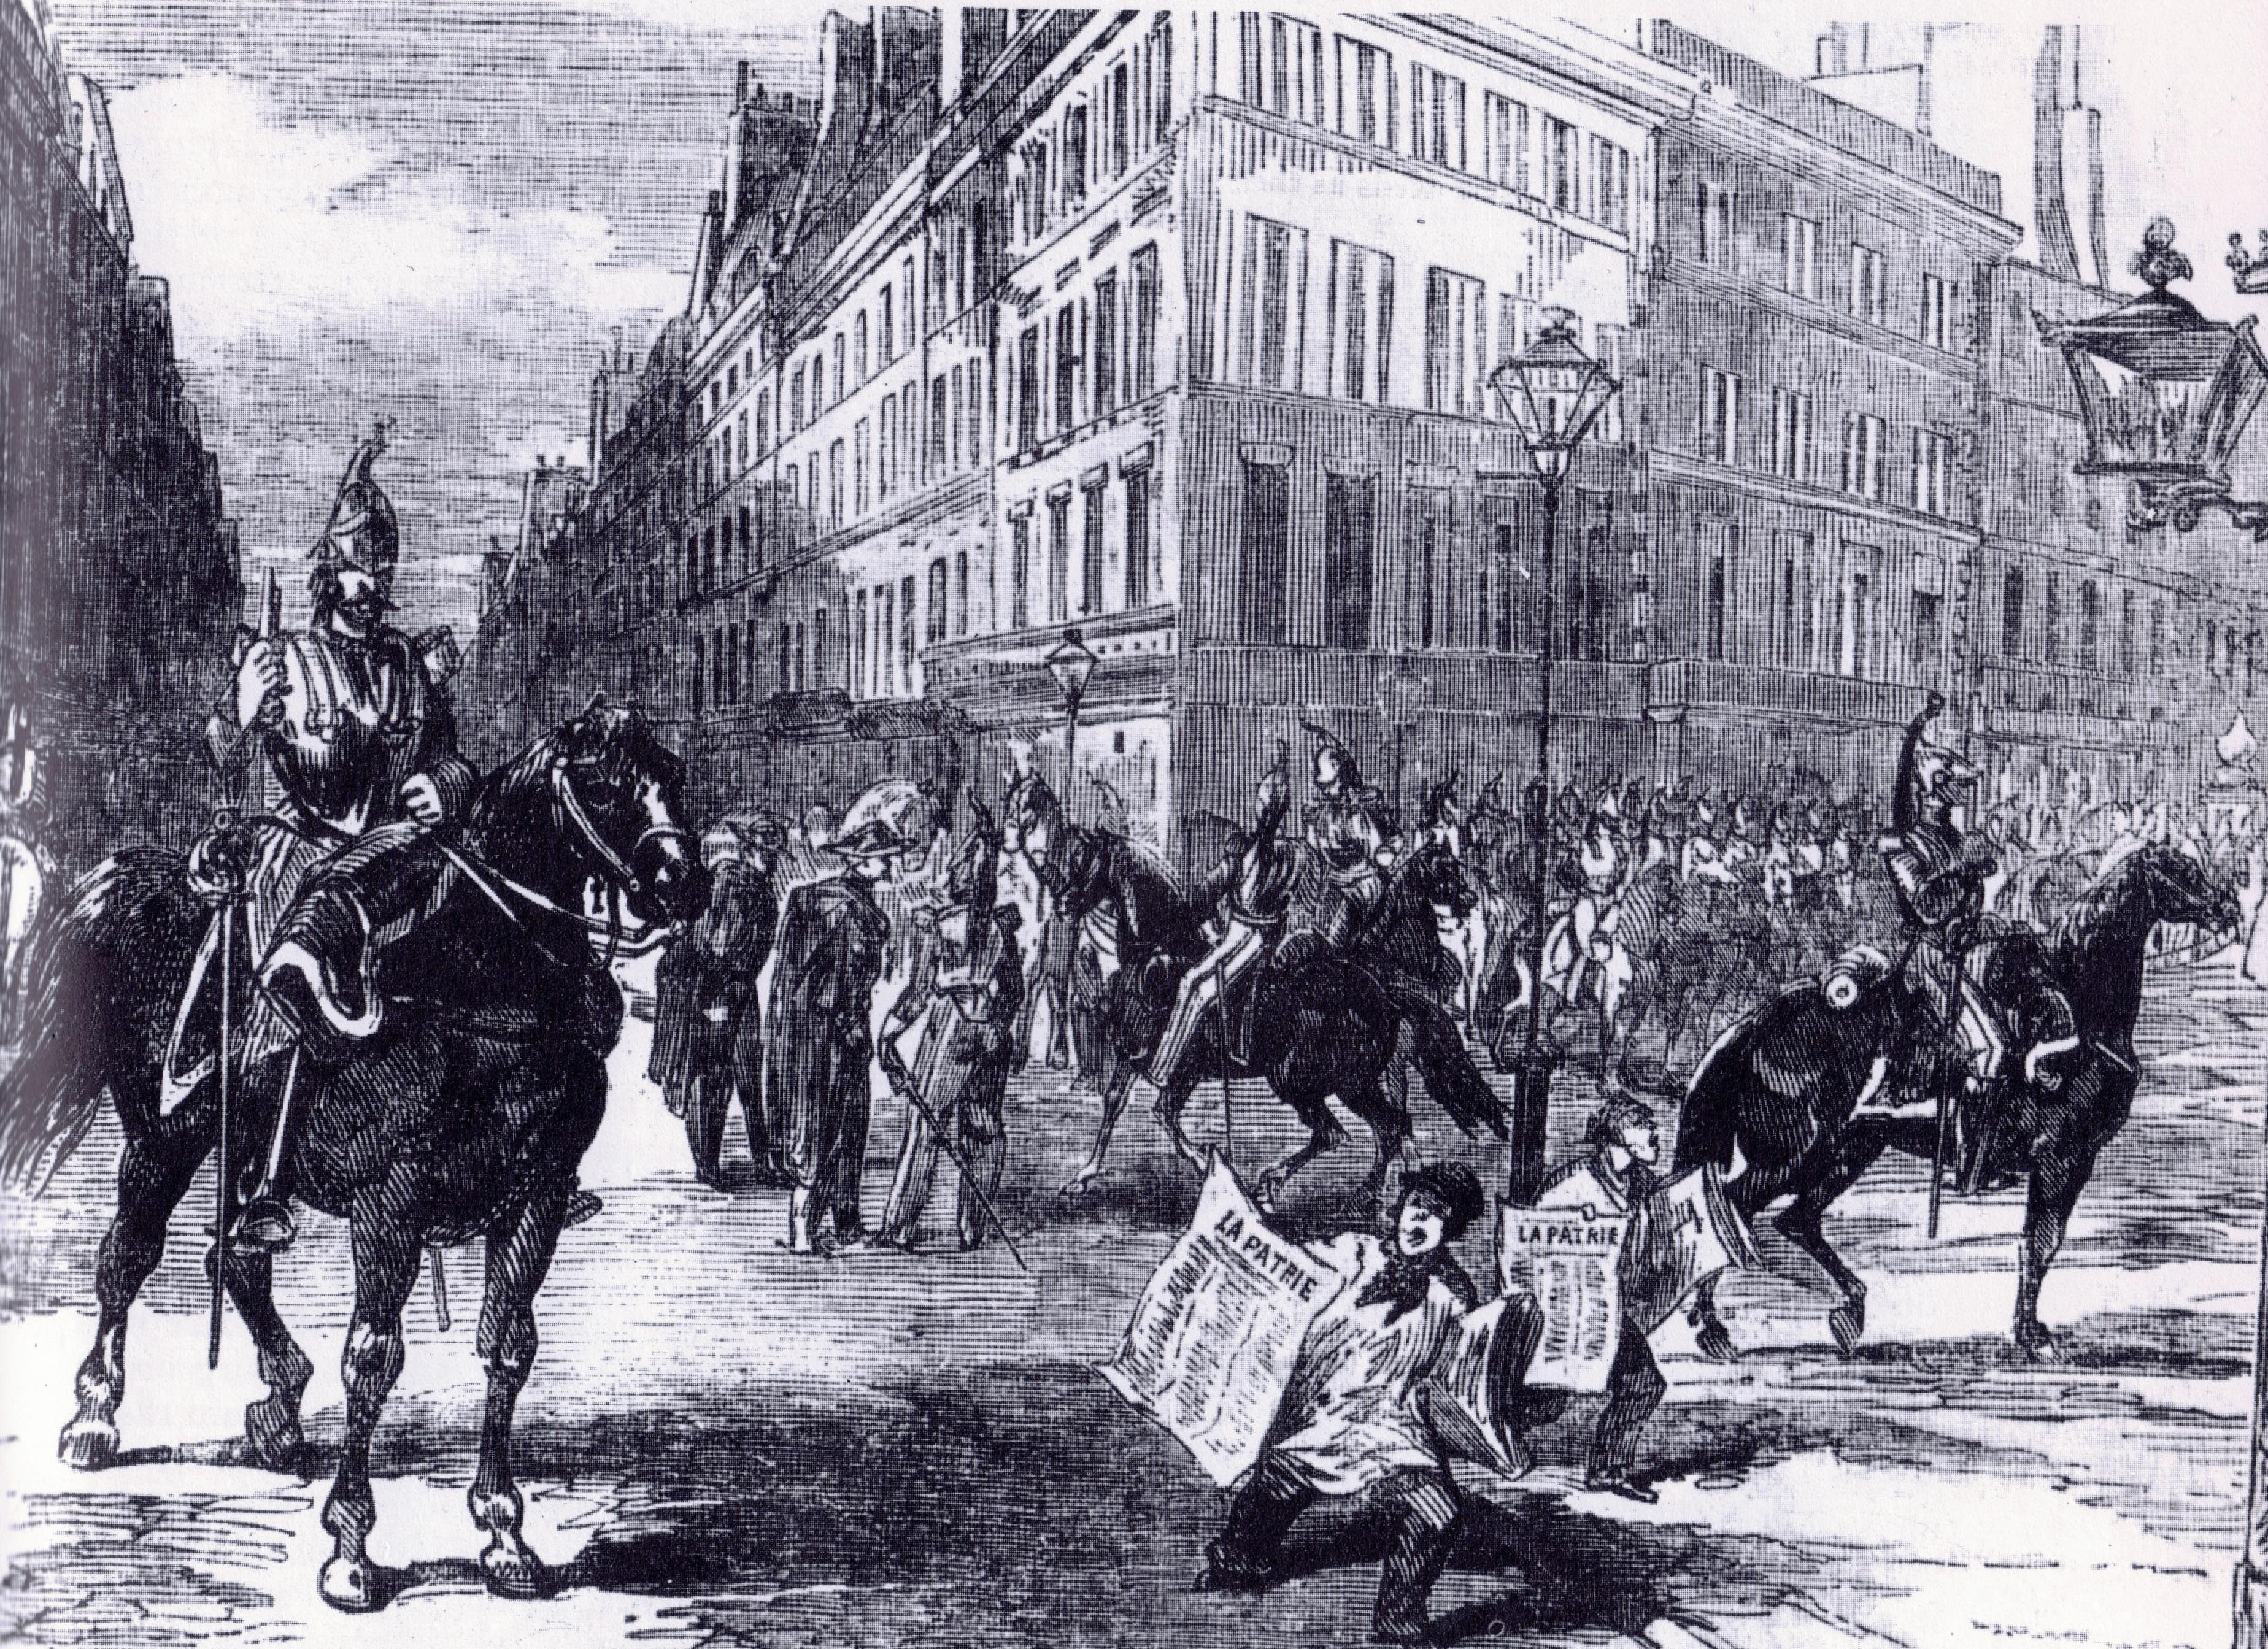 File:Cavalerie rues paris (1851).jpg